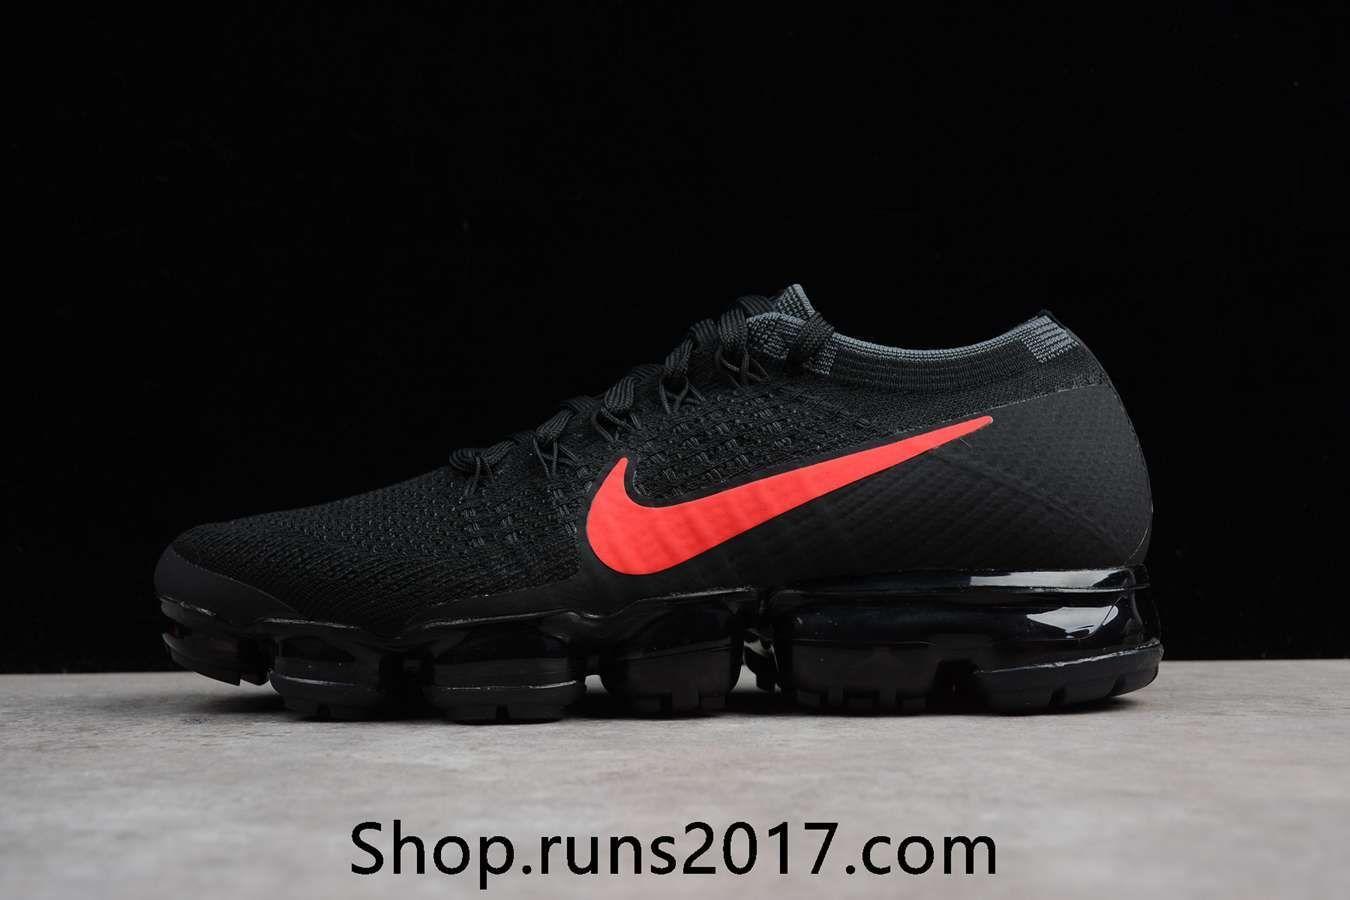 ab0964aa3c7 New Nike Air VaporMax 2018 Flyknit Black Red Tick Women Men